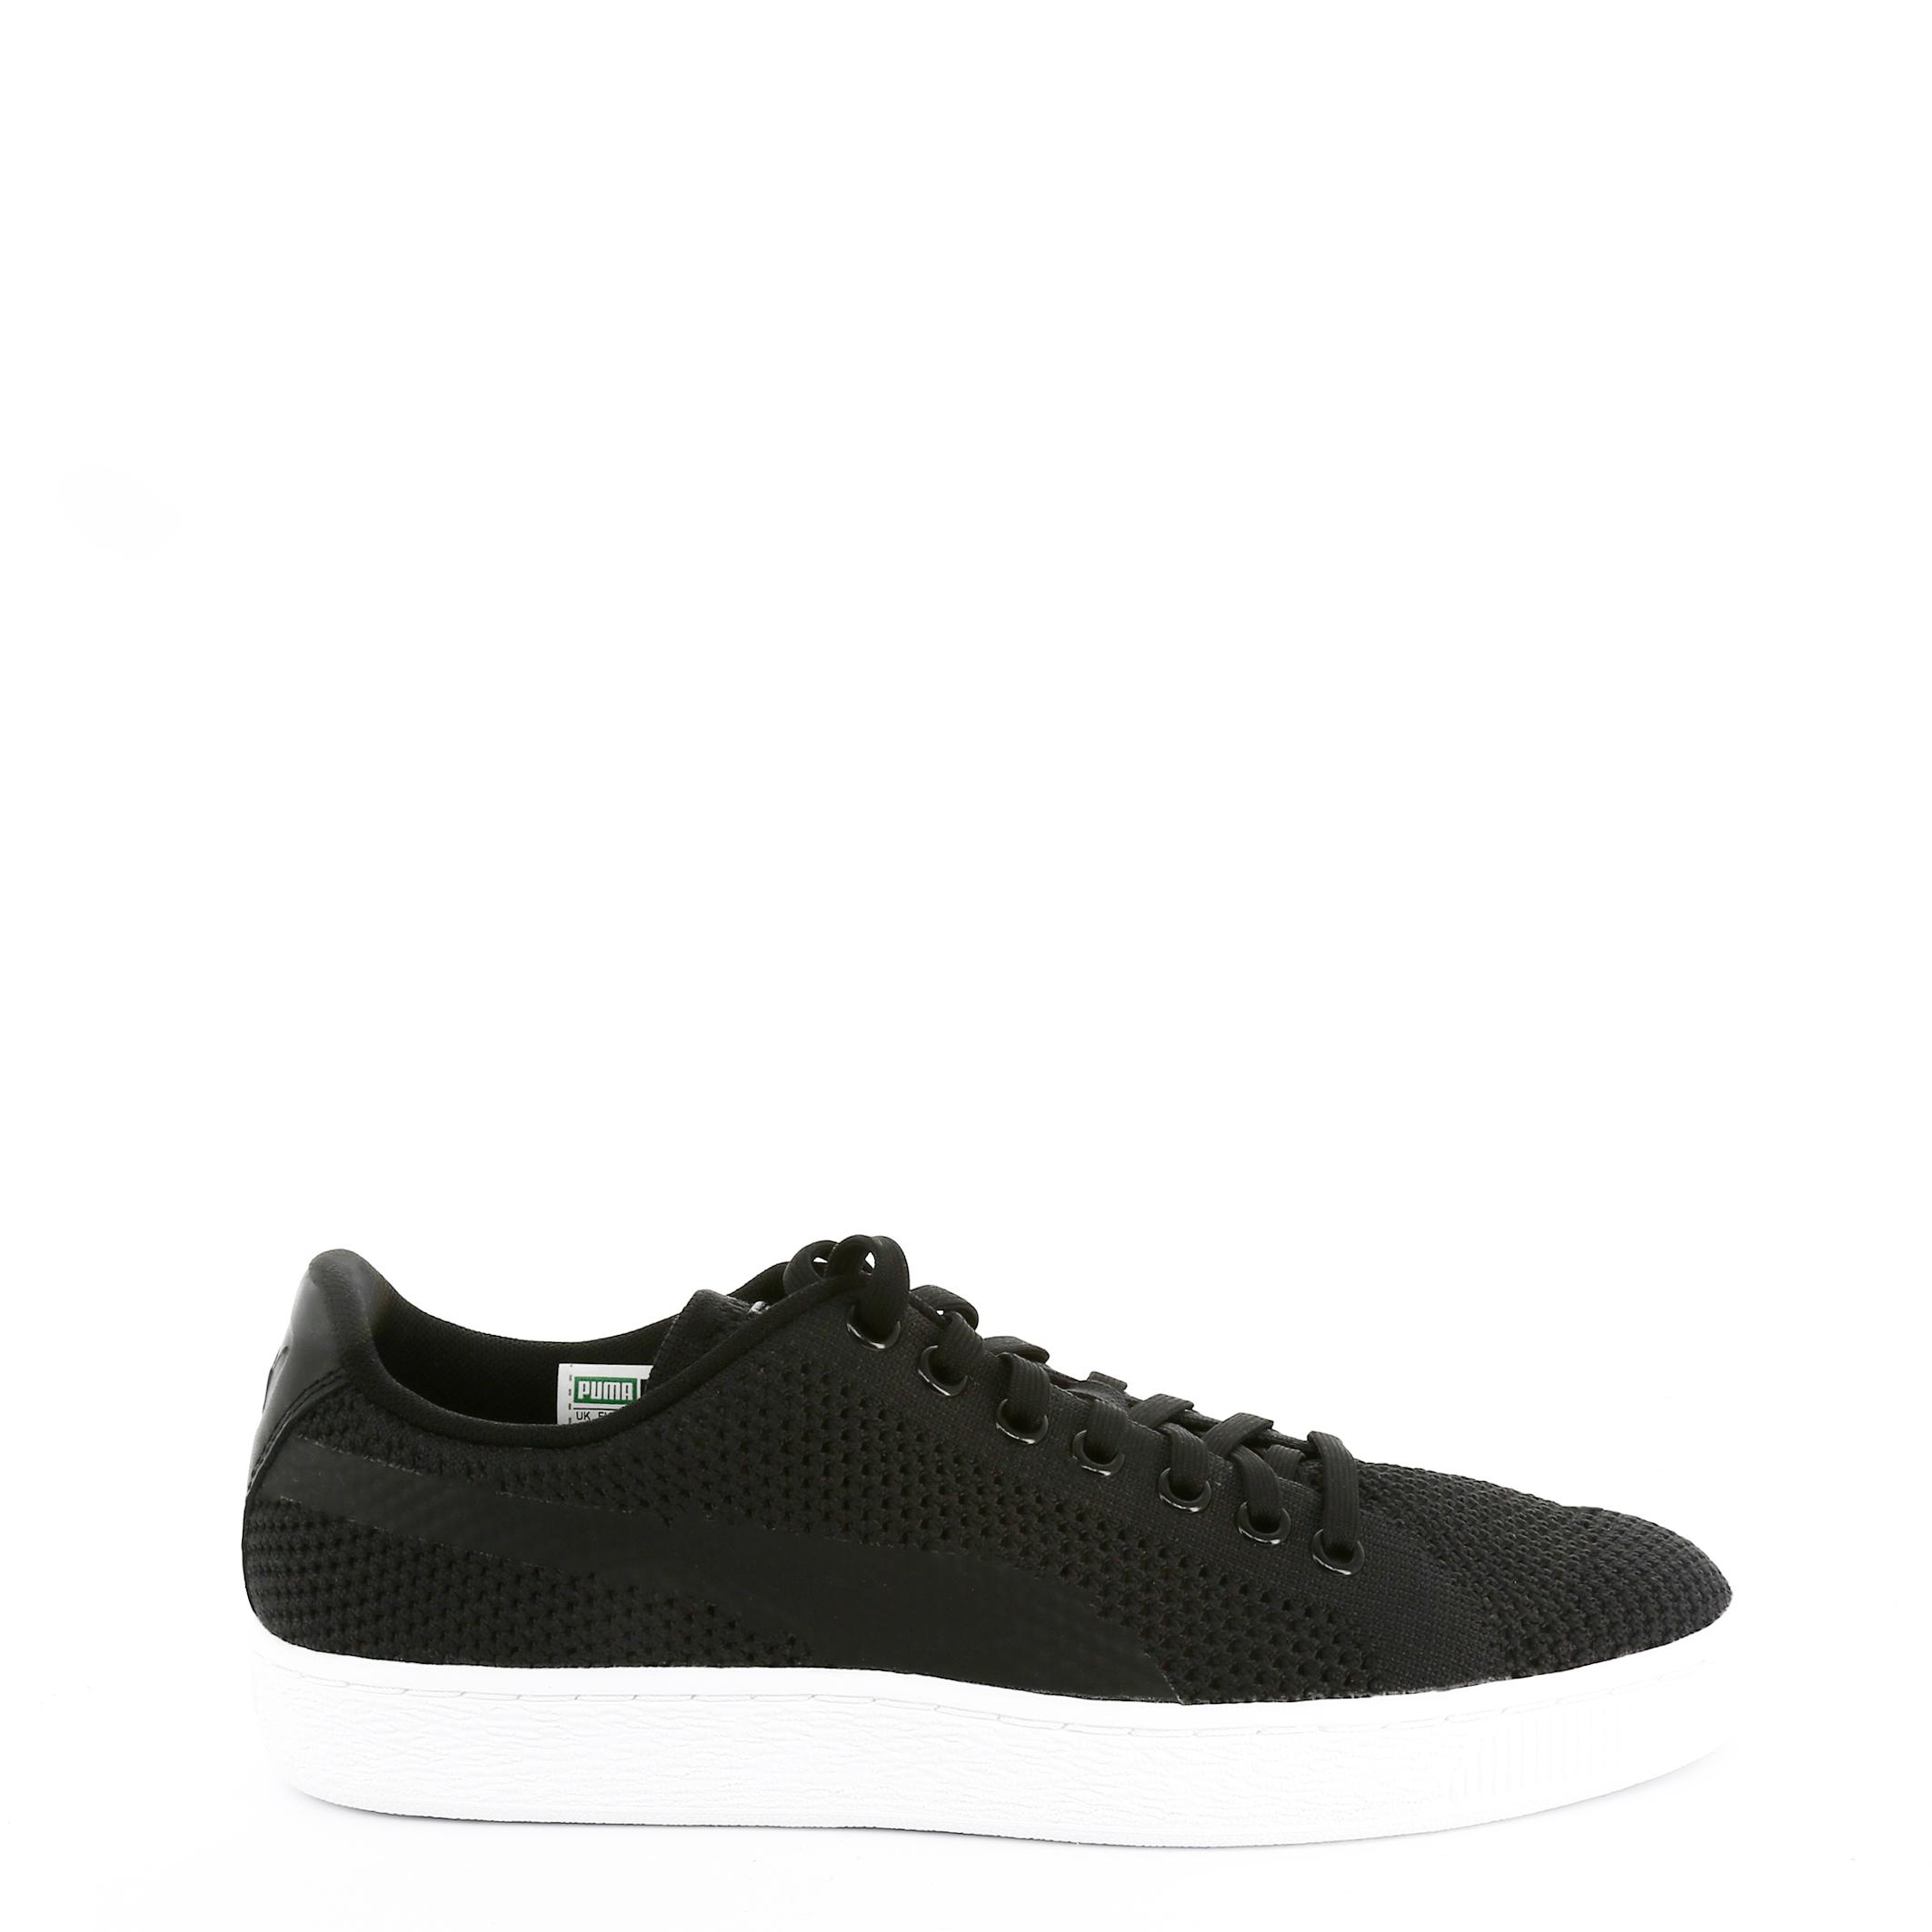 Baskets / Sport  Puma 363180 black